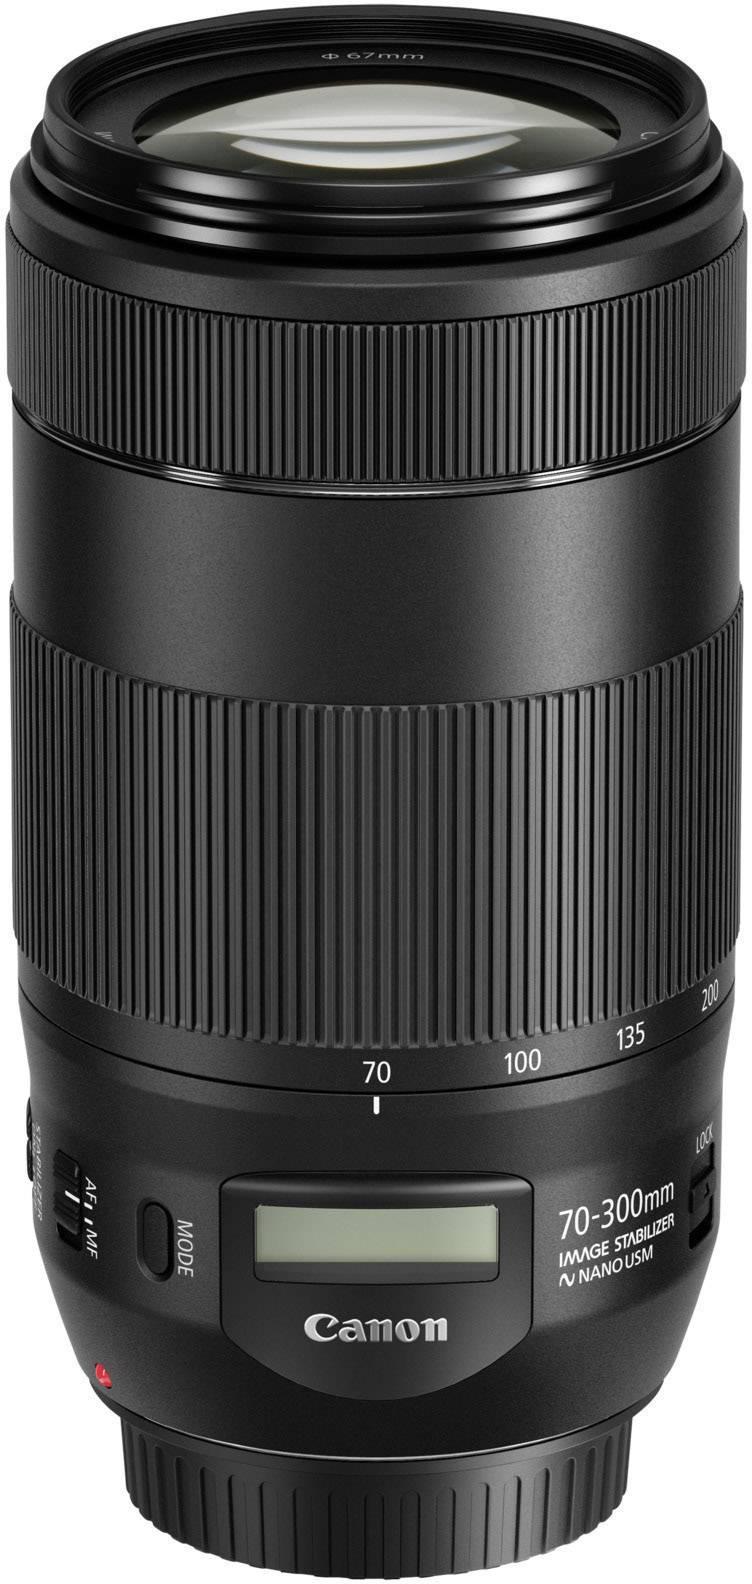 Zoom Objektiv Canon Ef 40 5670 300 Is Ii Usm F4 56 70 300